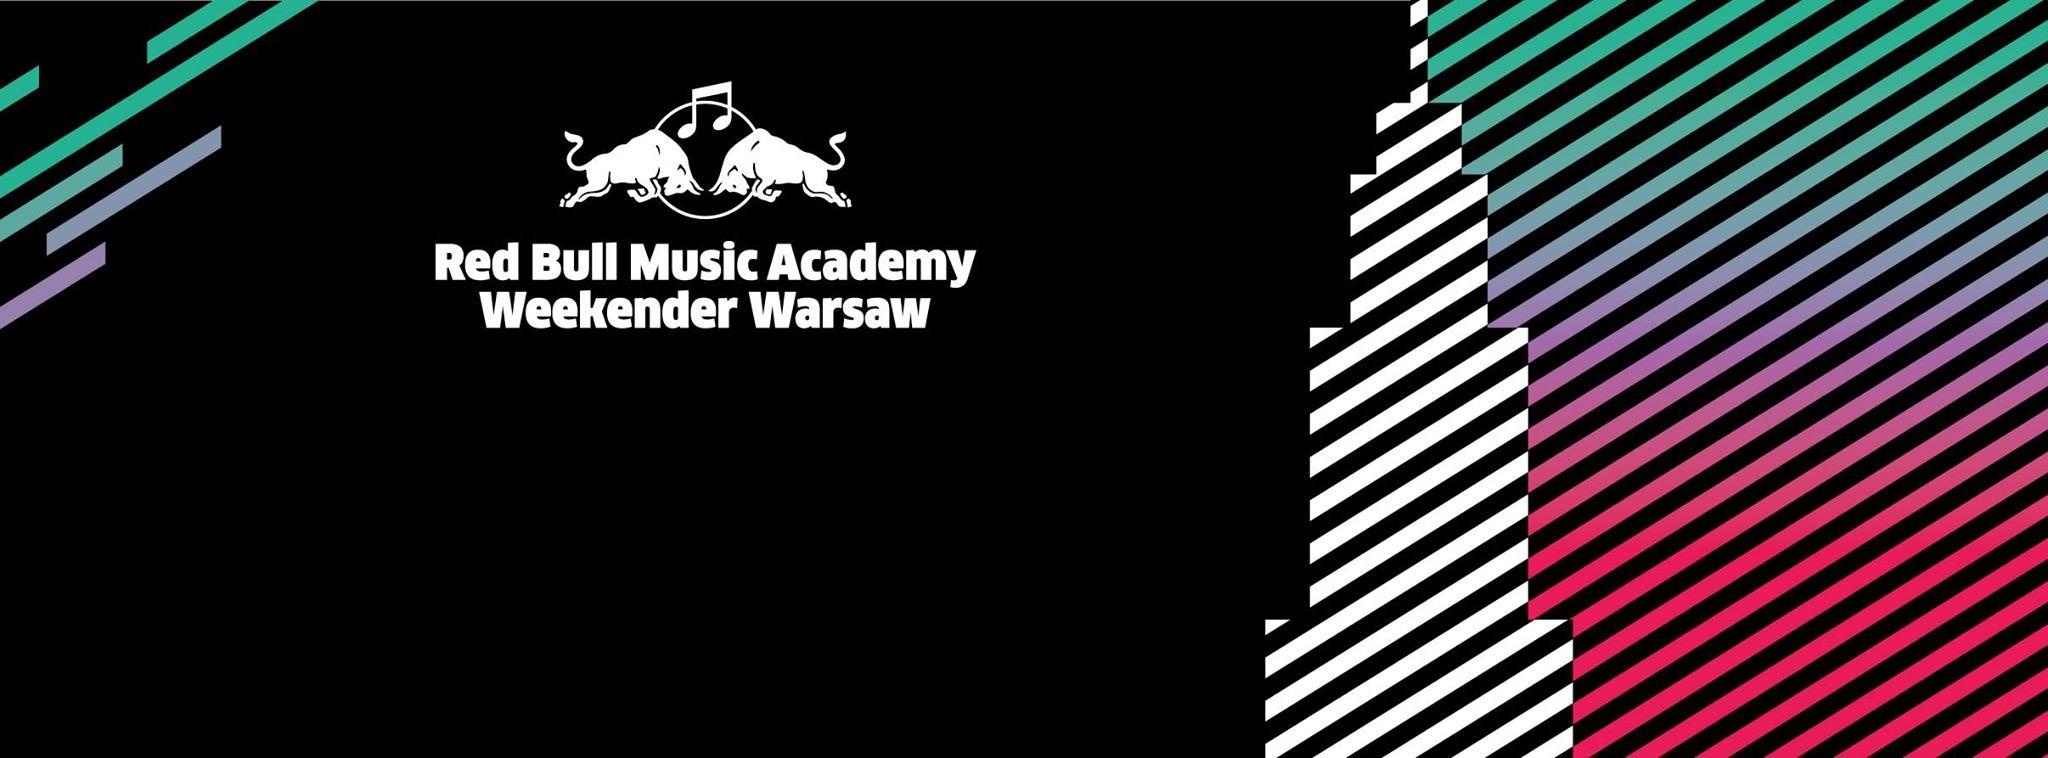 Red Bull Music Academy Weekender Warsaw: BRODKA CLASHES * STORMZY * IBEYI * ZEBRA KATZ * ANDY STOTT * Kangding Ray * ZAMILSKA &